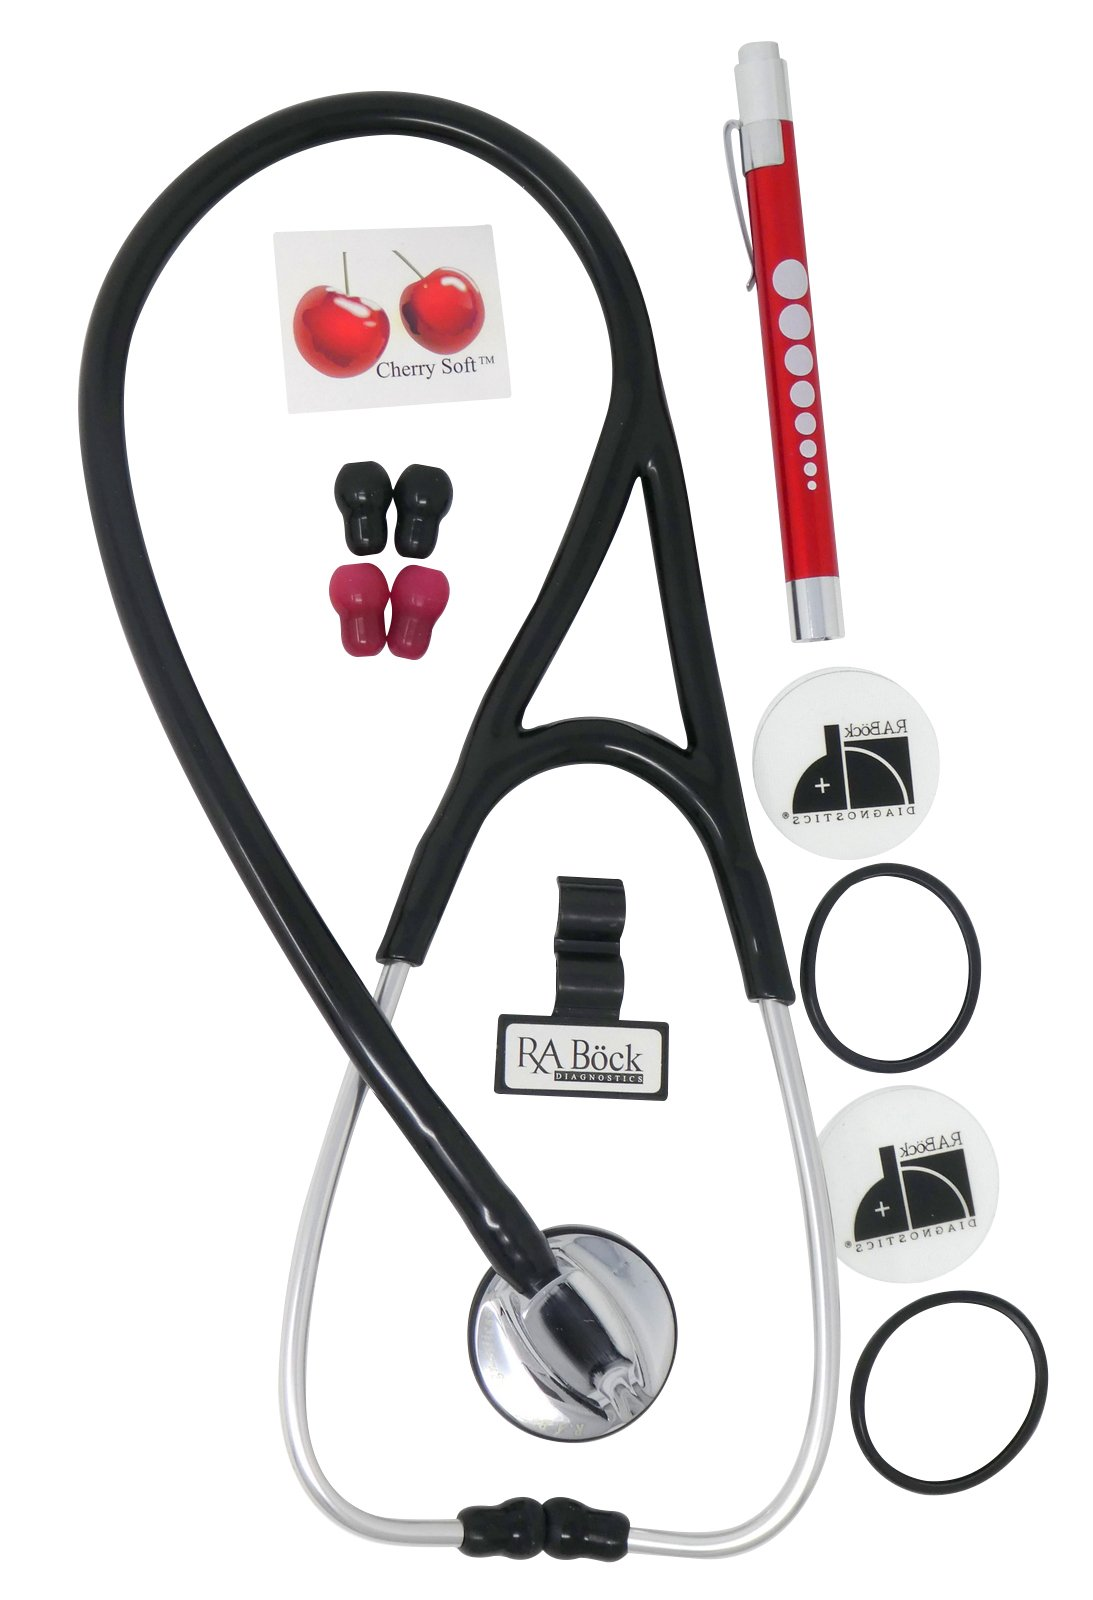 Pro Physician Single Head Cardiology Stethoscope